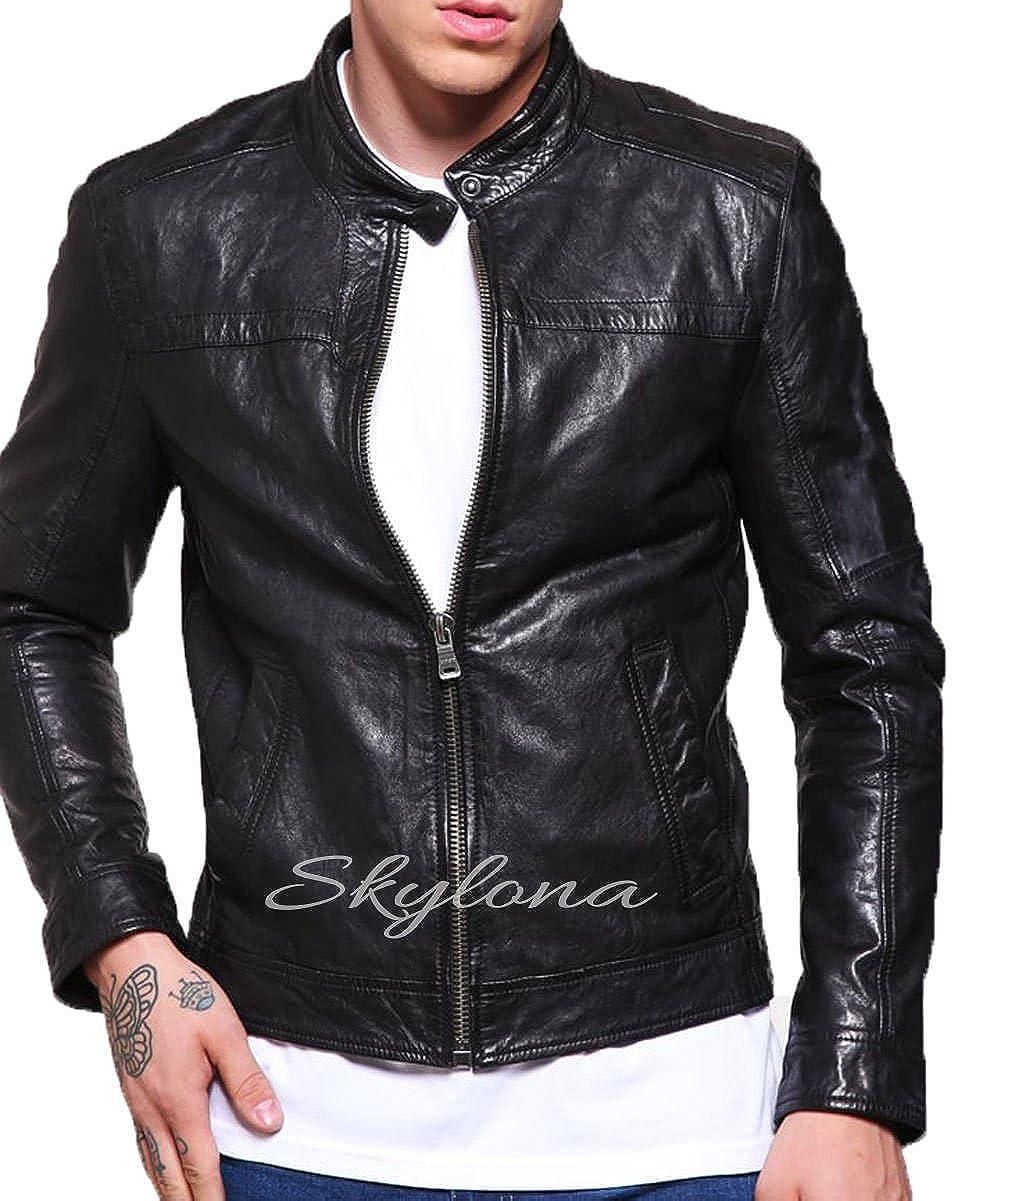 Skylona Mens Leather Jackets Motorcycle Bomber Biker Real Leather Jacket 449